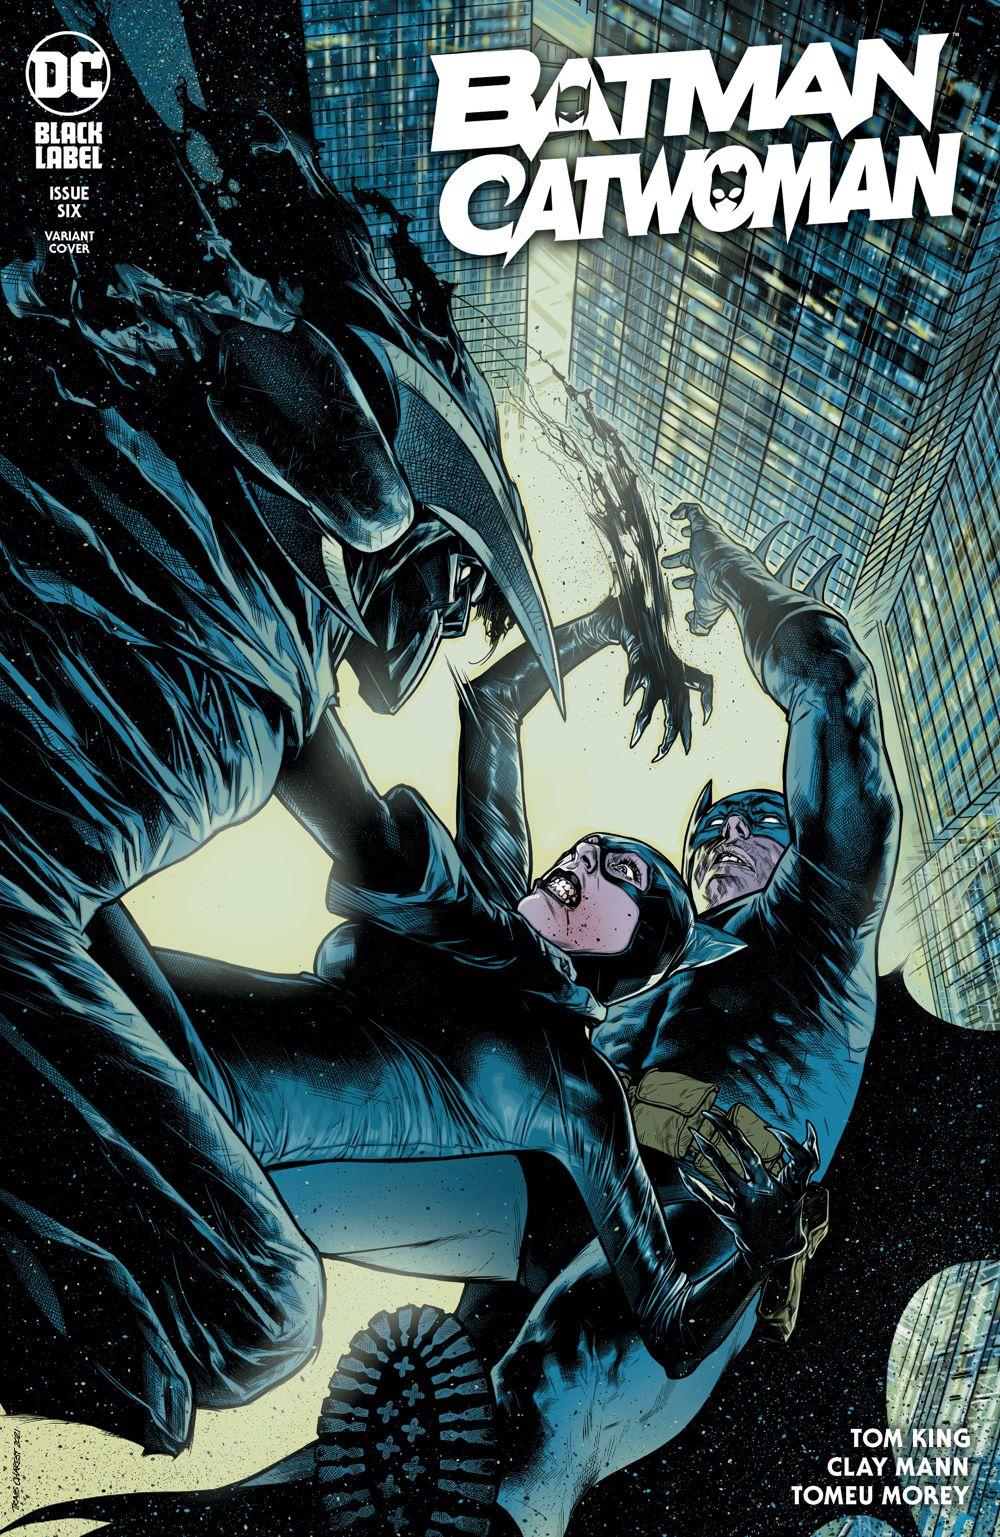 2020 Catwoman Joelle Jones 1-25 /& Annual DC comics 2019